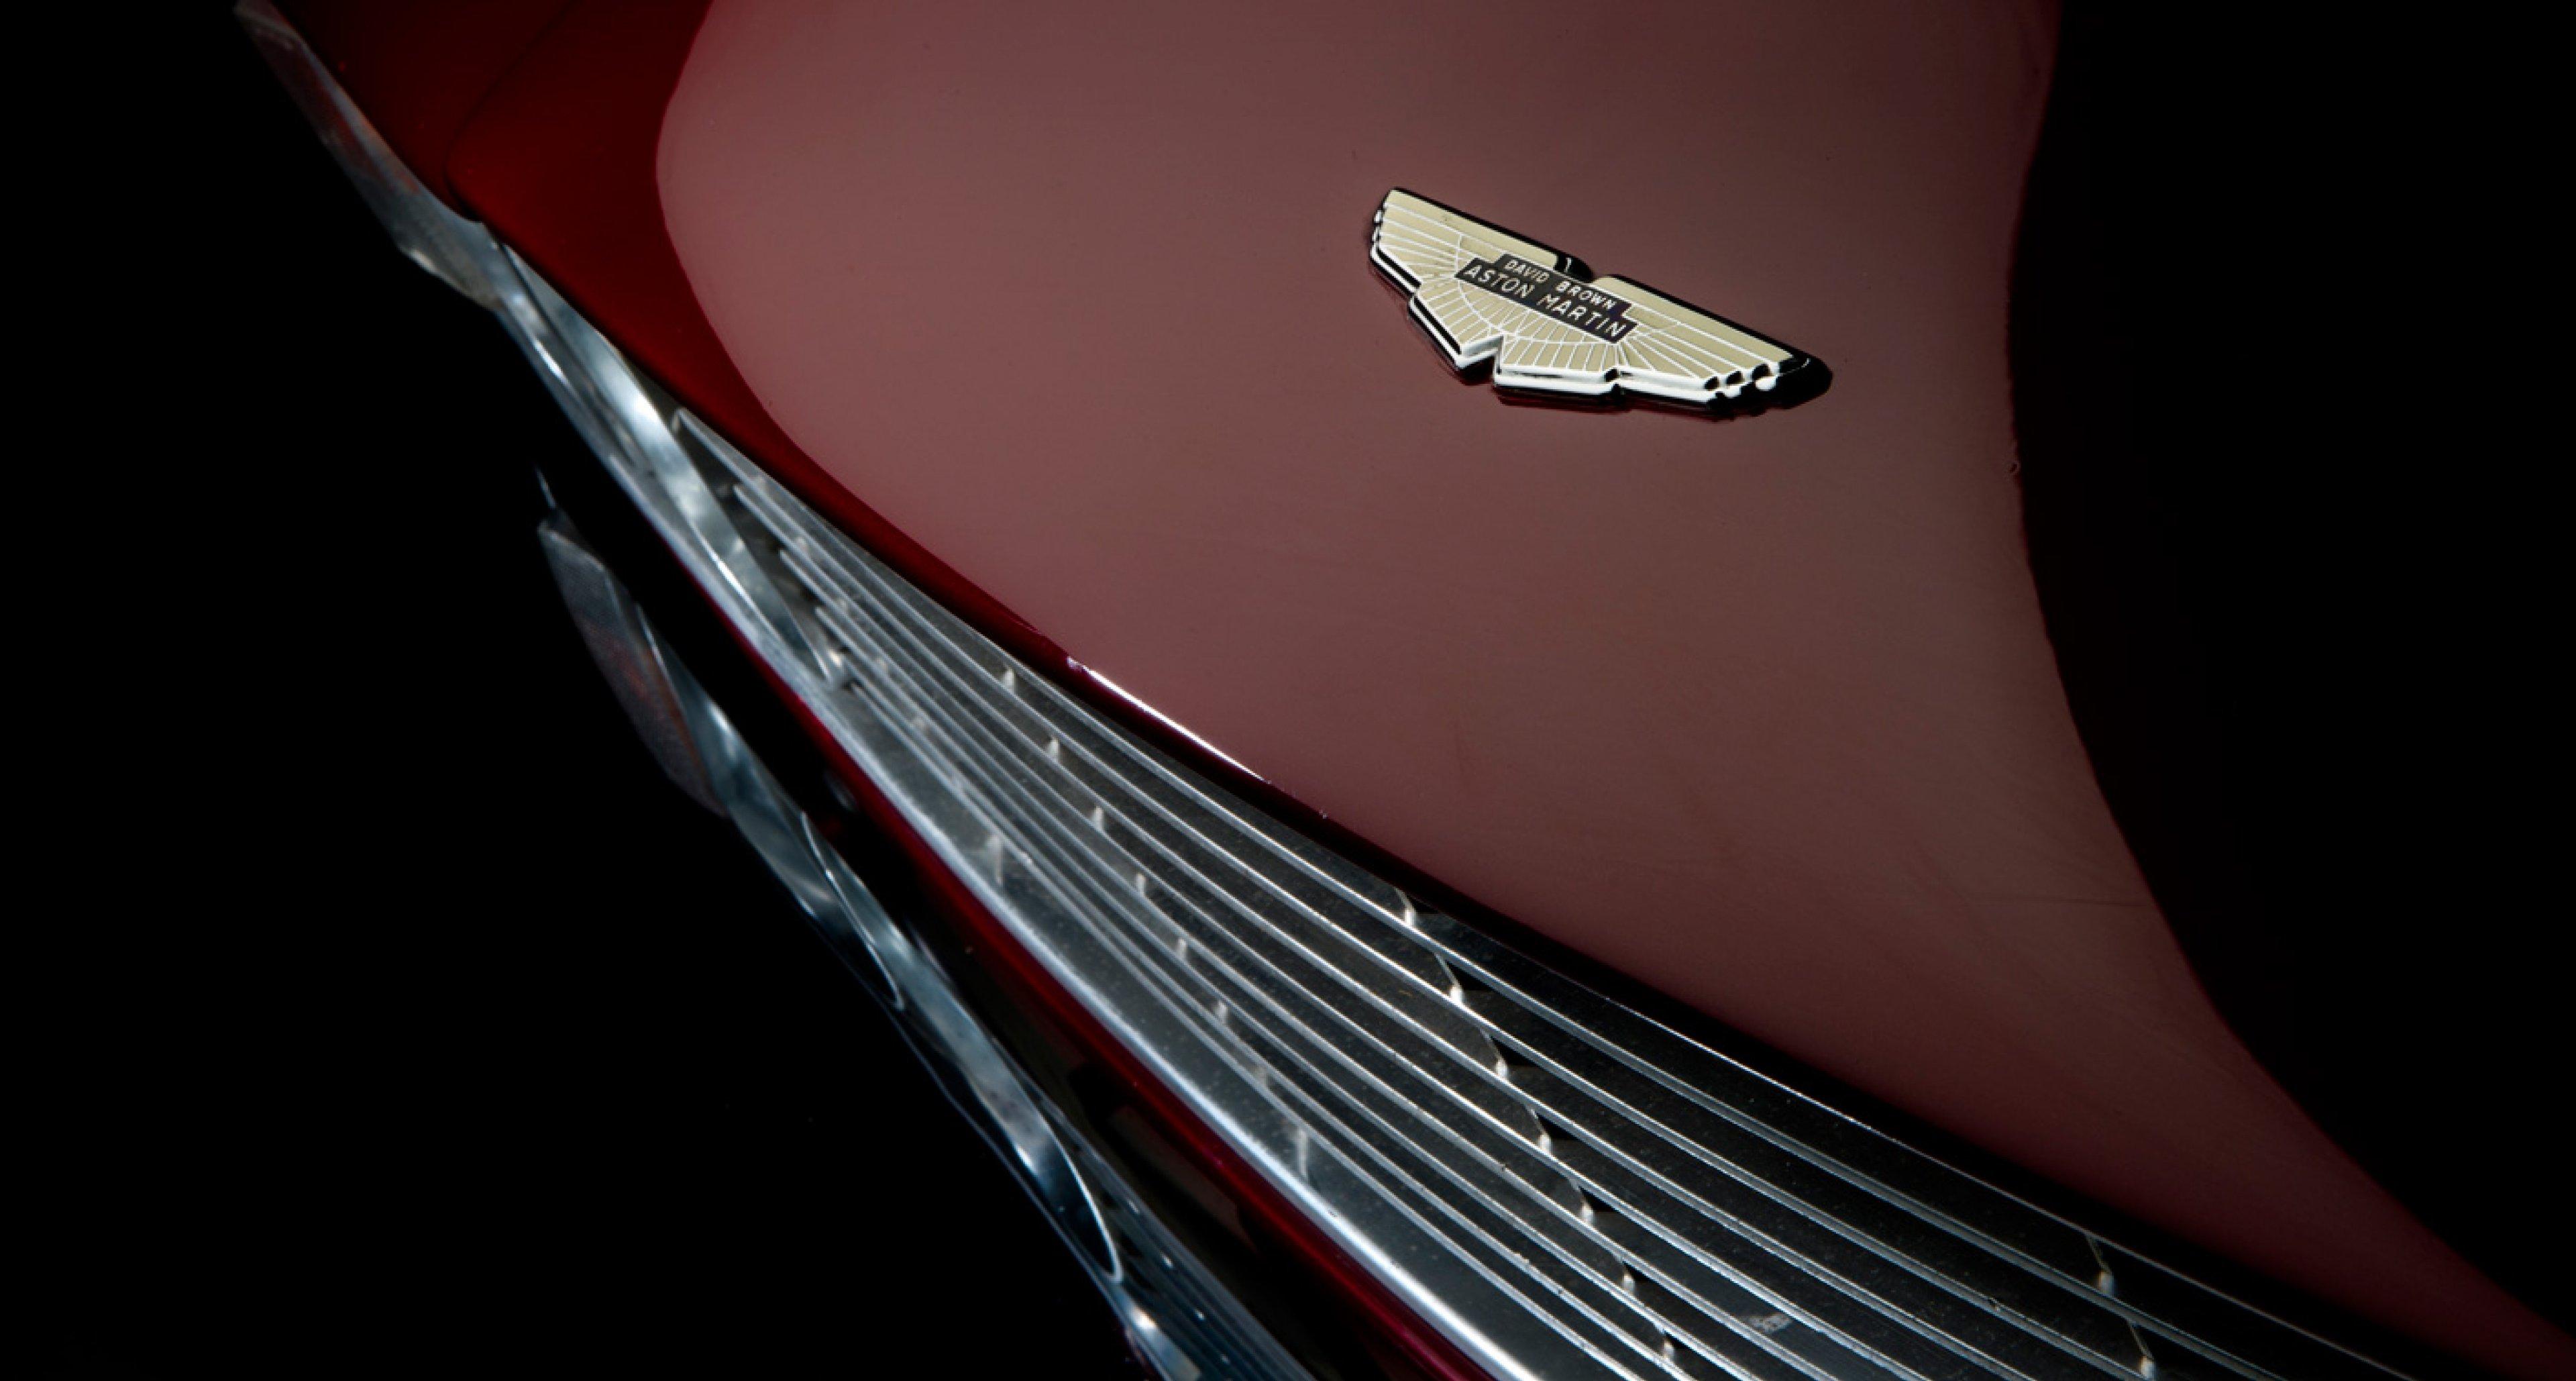 Aston Martin DBS V8FI prototype